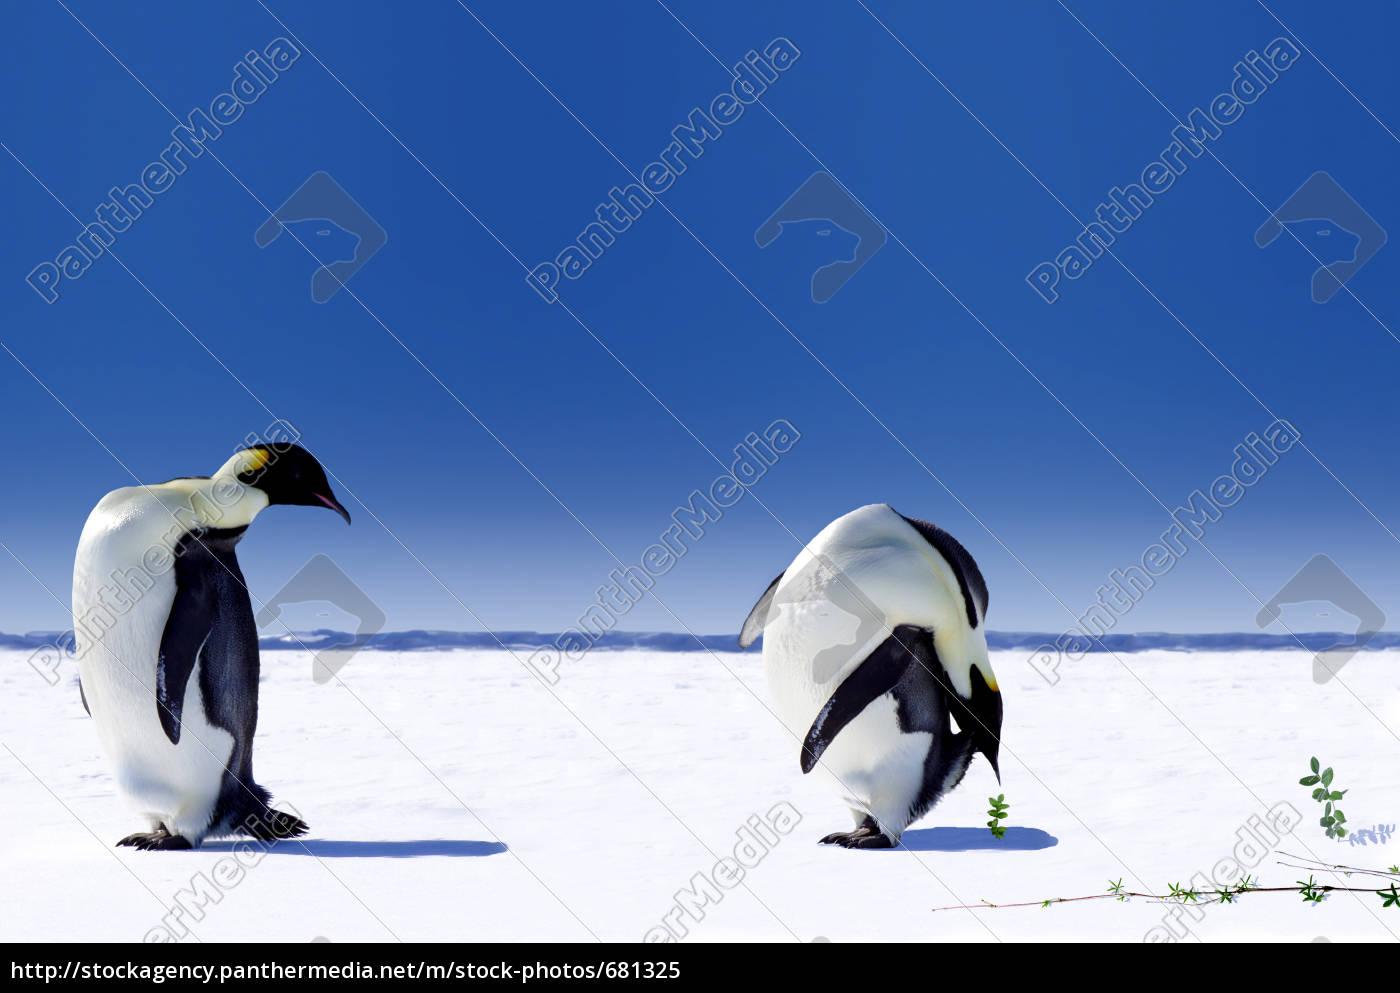 global, warming - 681325